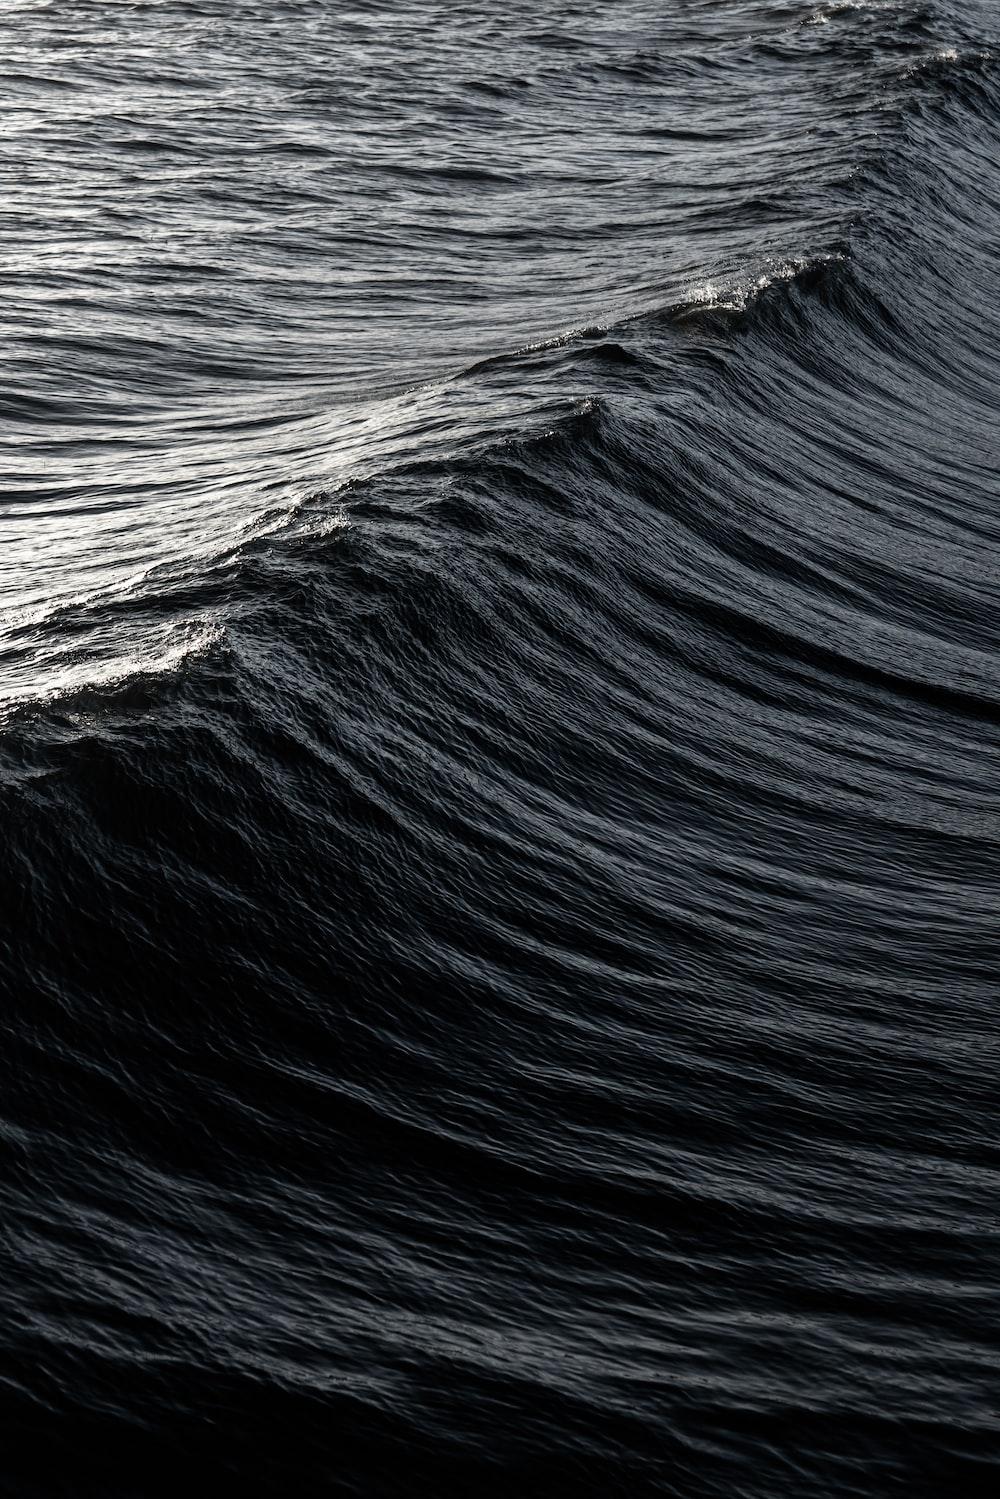 blue ocean water during daytime